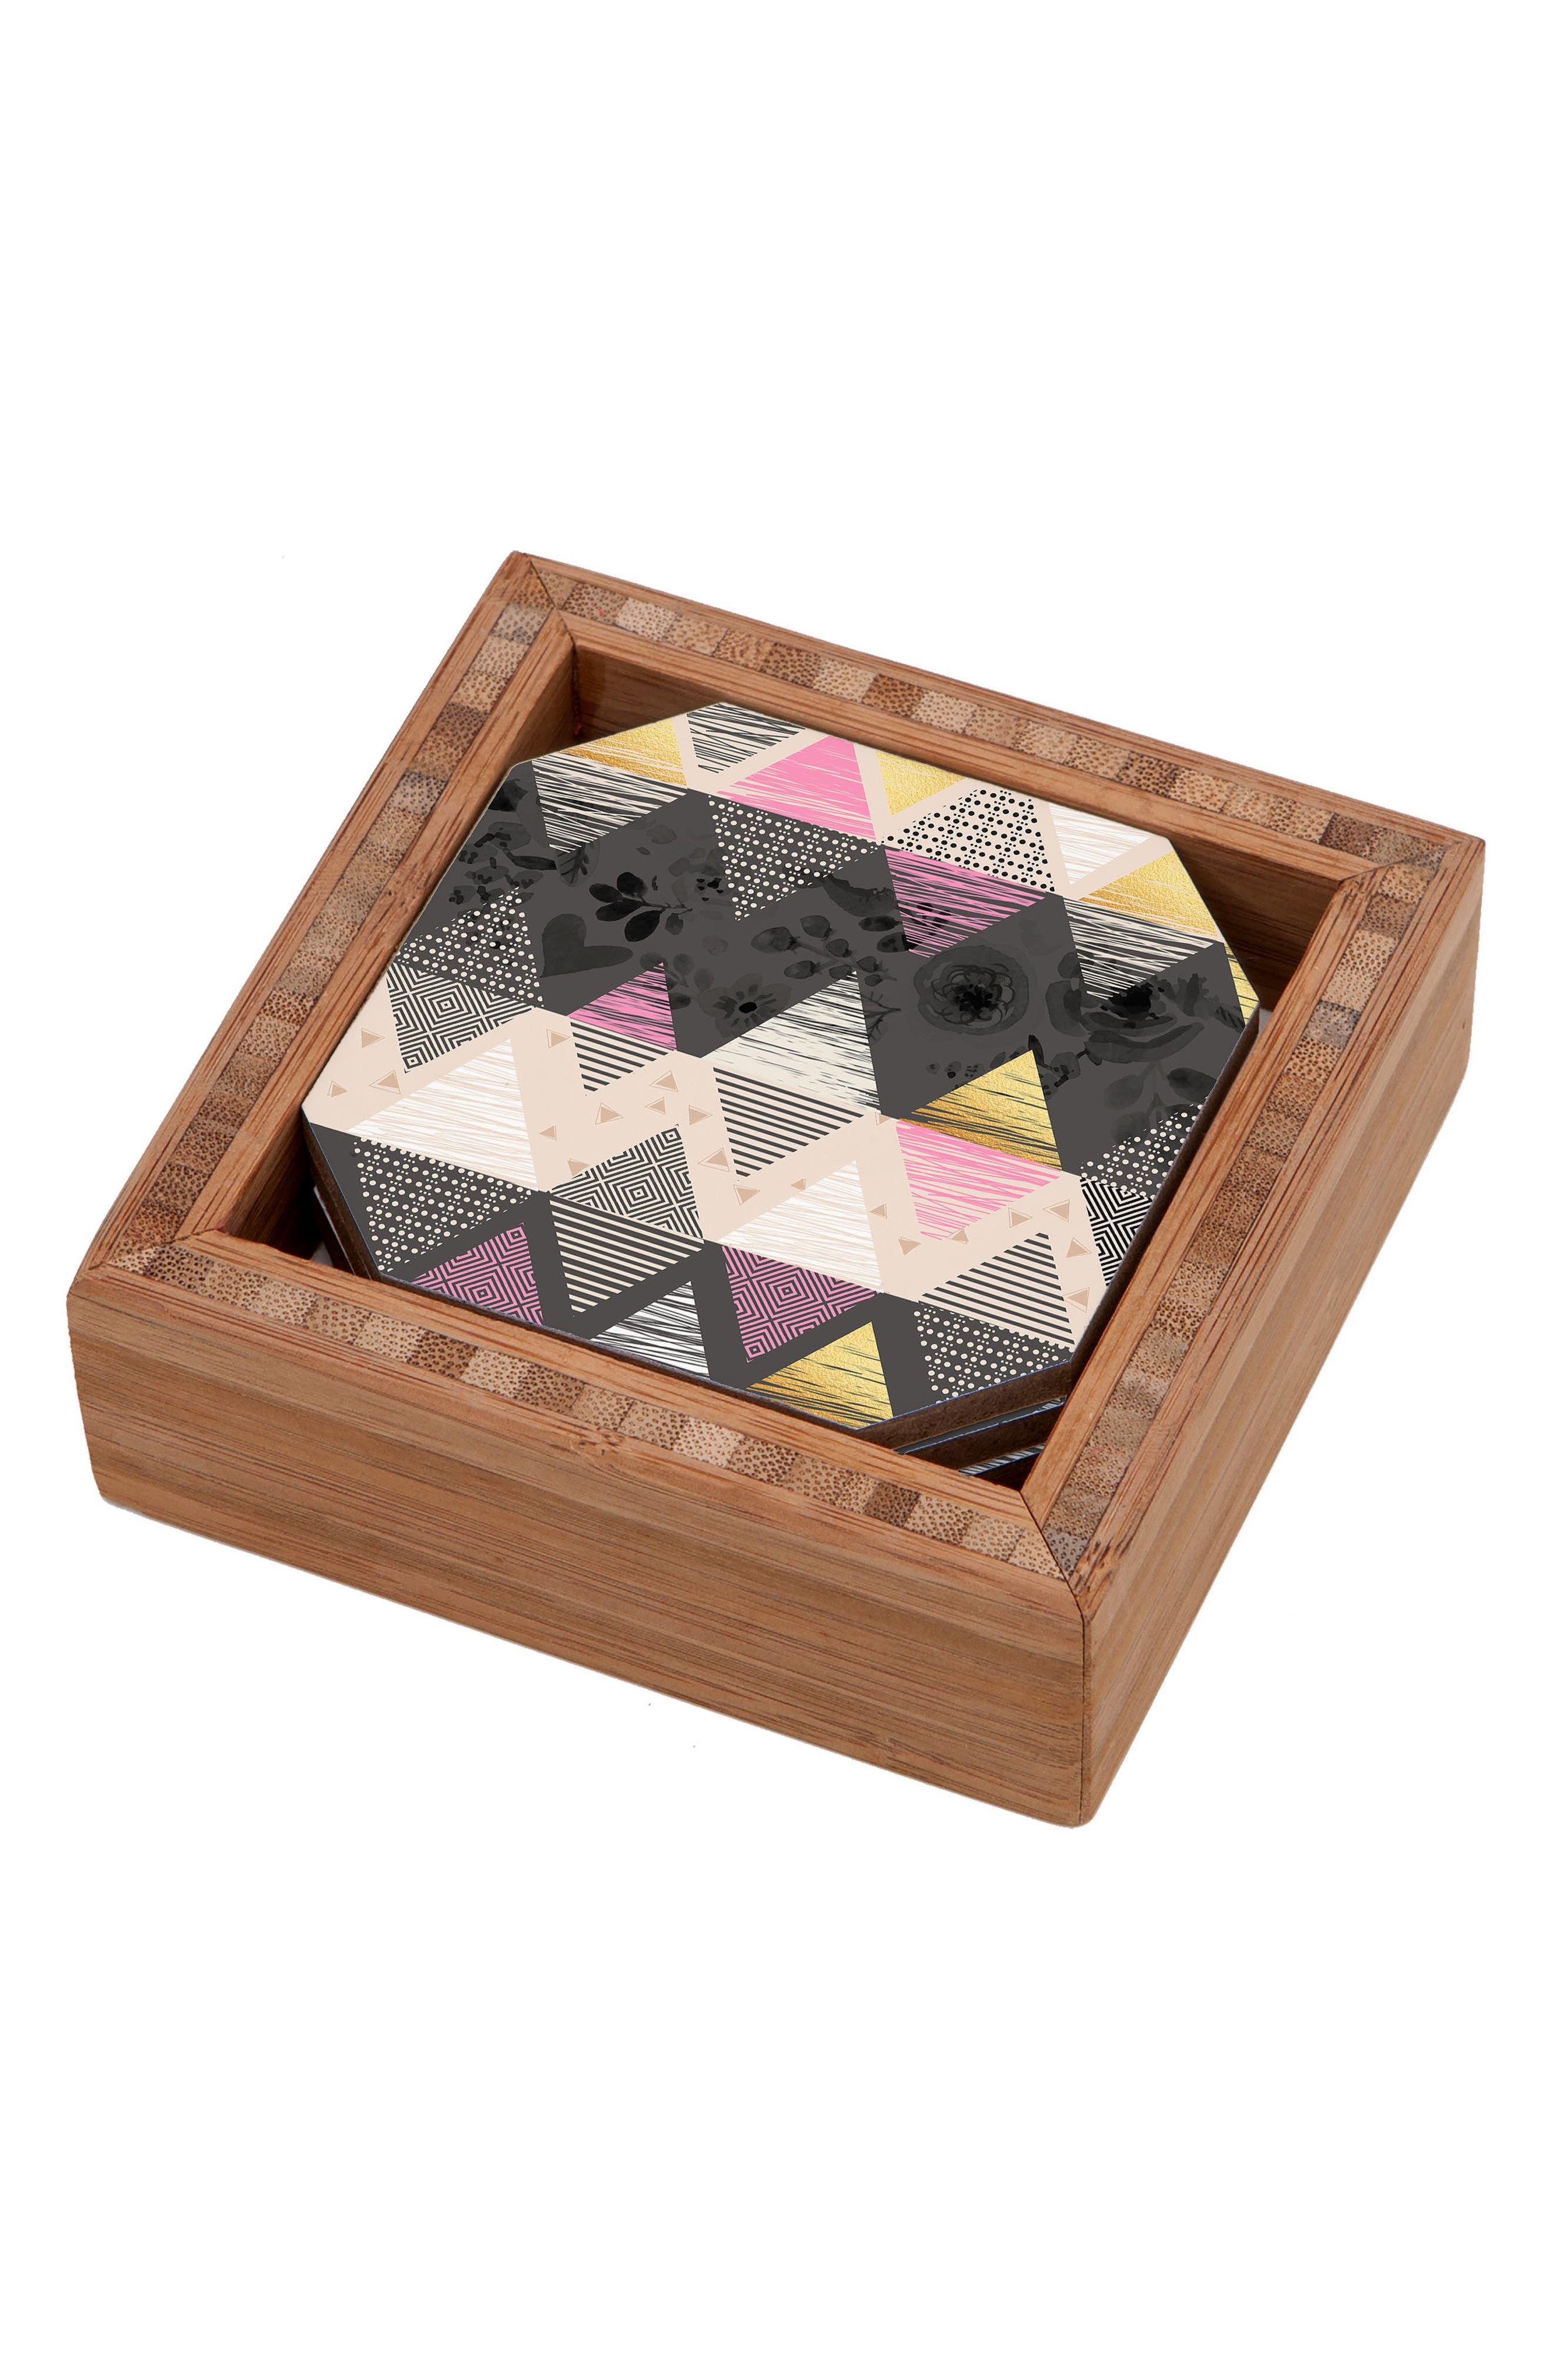 Geometric Set of 4 Coasters,                             Main thumbnail 1, color,                             001